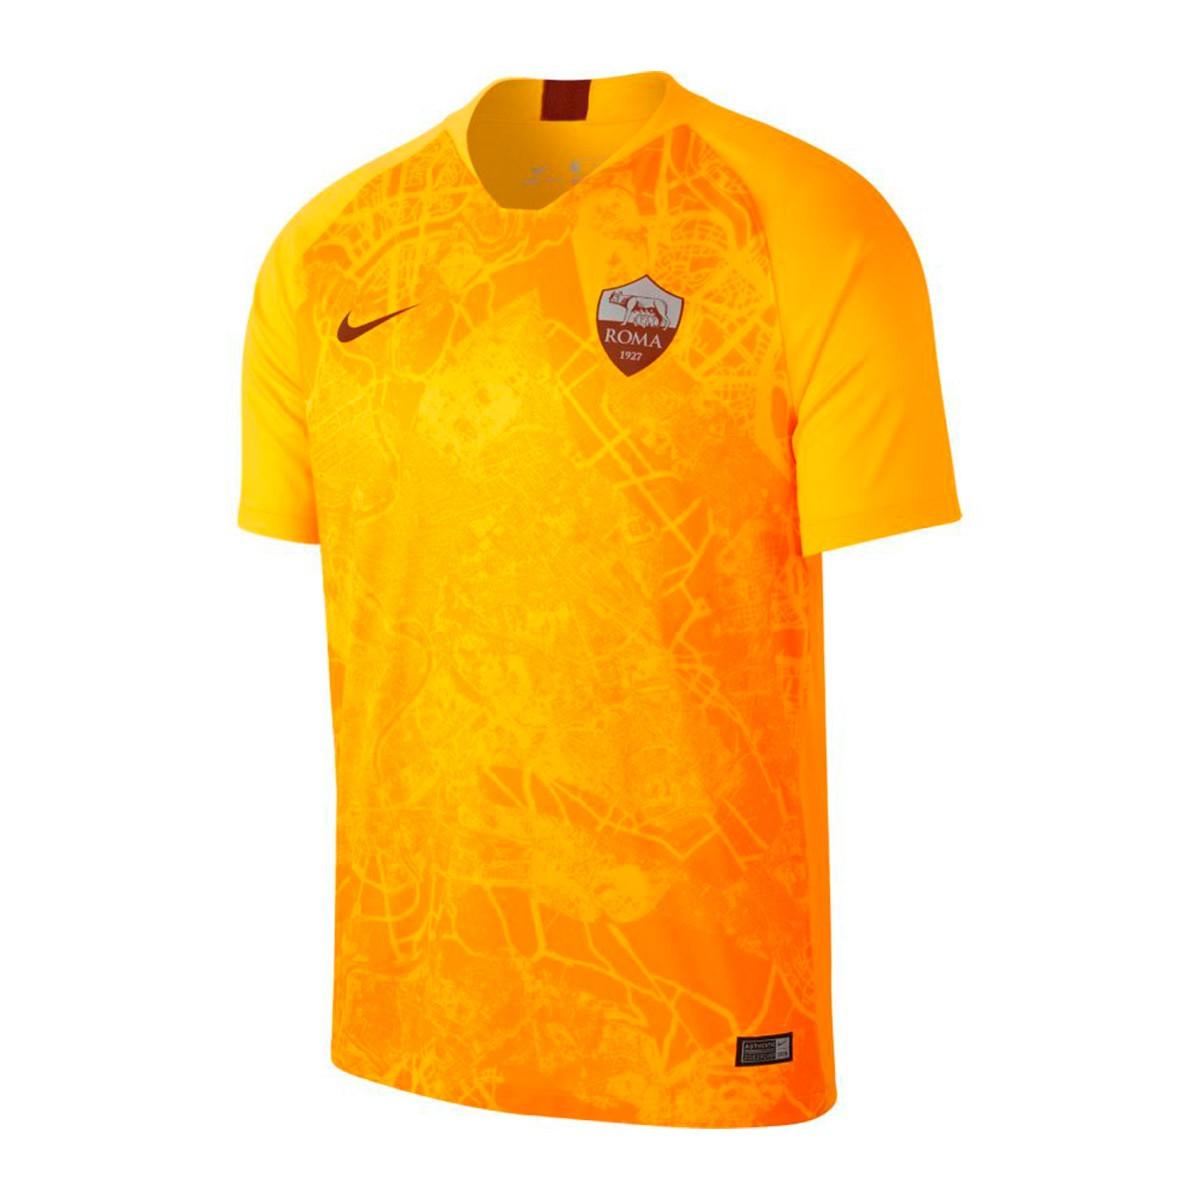 9834a4f37 Jersey Nike AS Roma Stadium 2018-2019 Third University gold-Mars stone -  Football store Fútbol Emotion